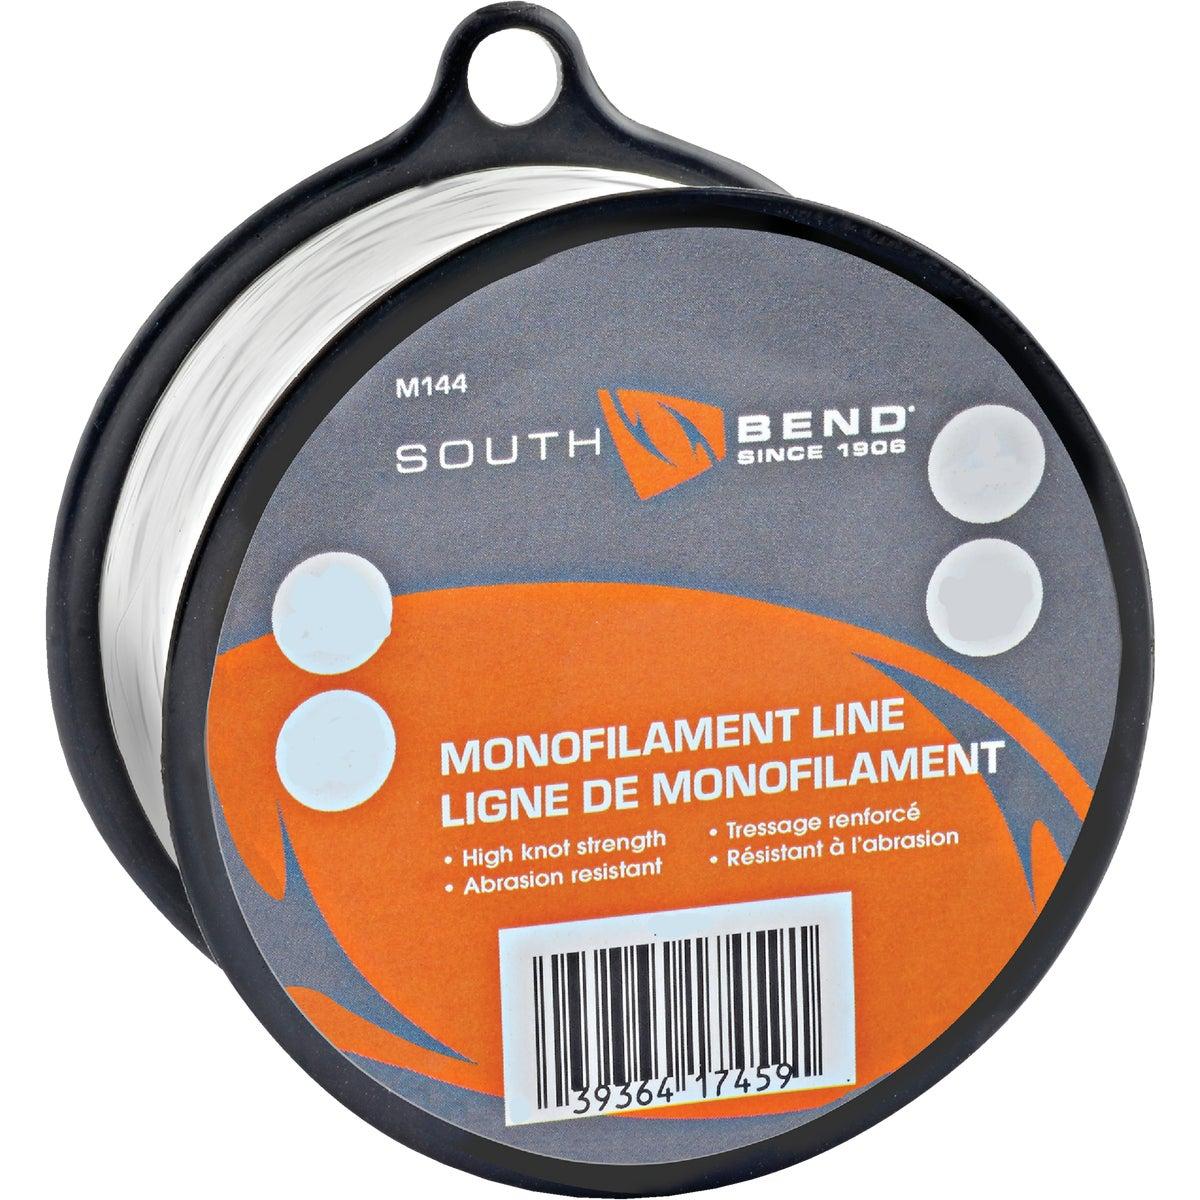 South Bend Sporting Goods 4LB 1125YD MONO LINE M144